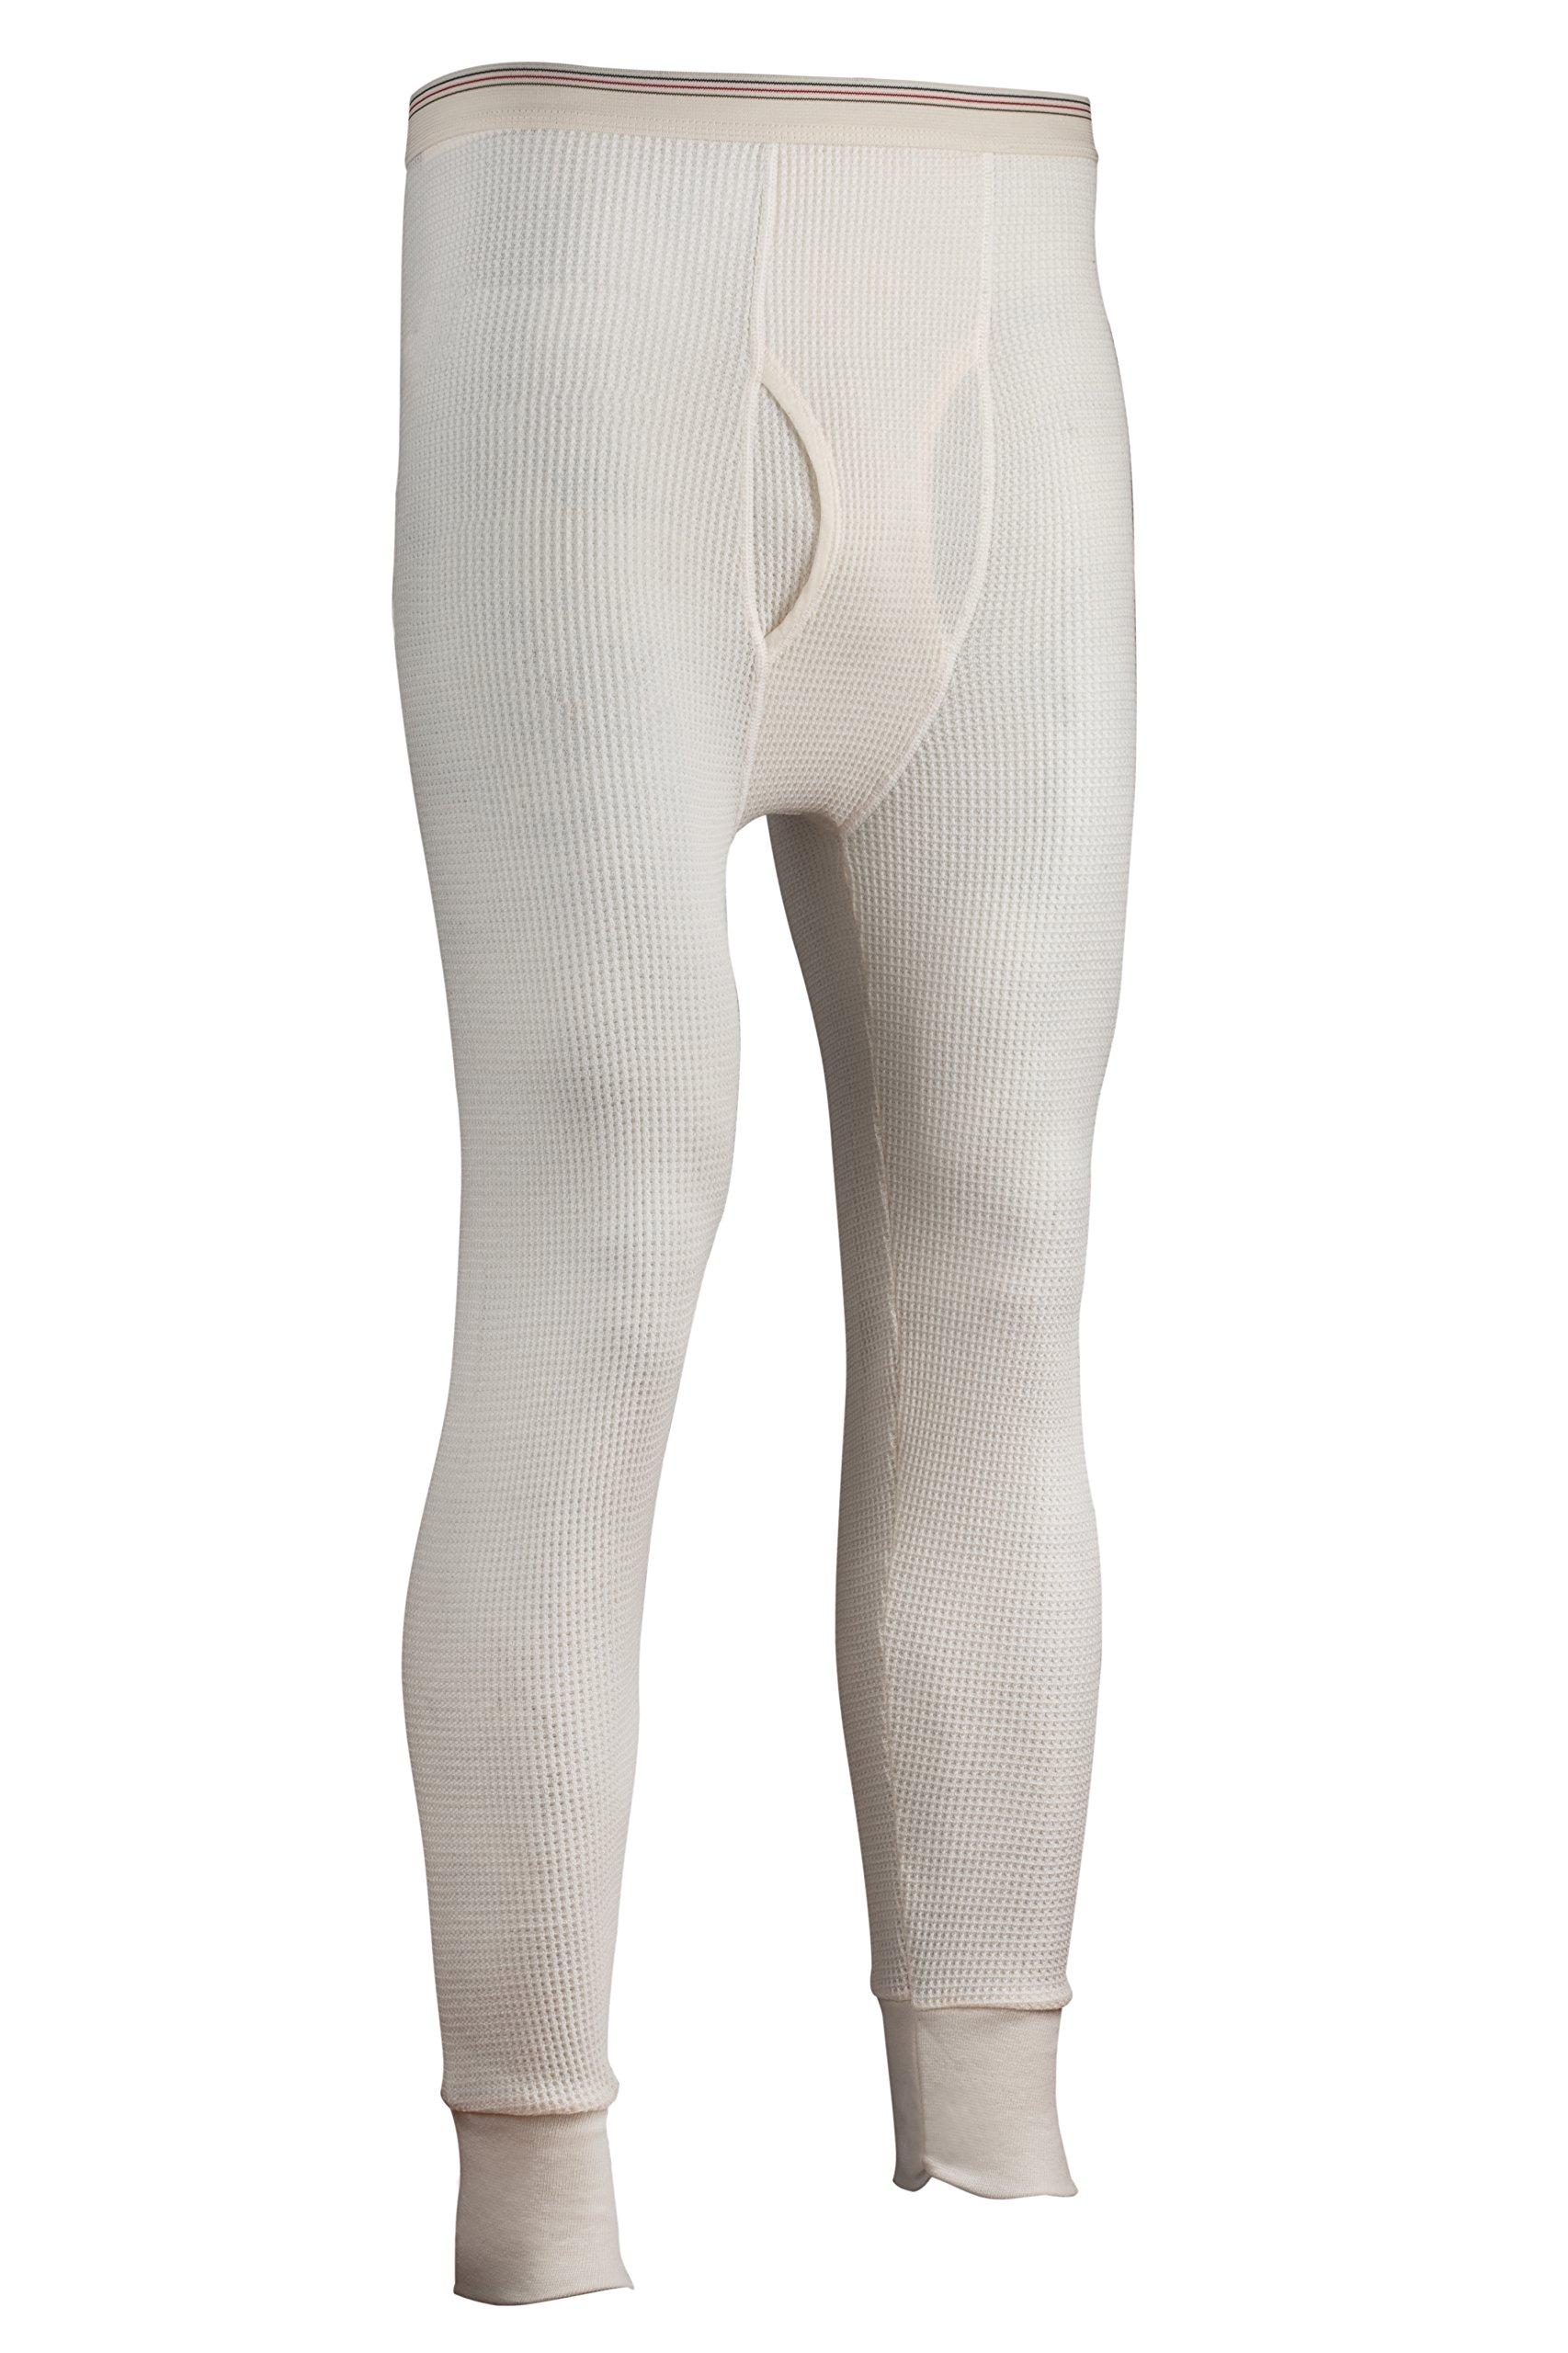 Indera Men's Tall Traditional Long Johns Thermal Underwear Pant, Natural, 3X-LargeTall by Indera